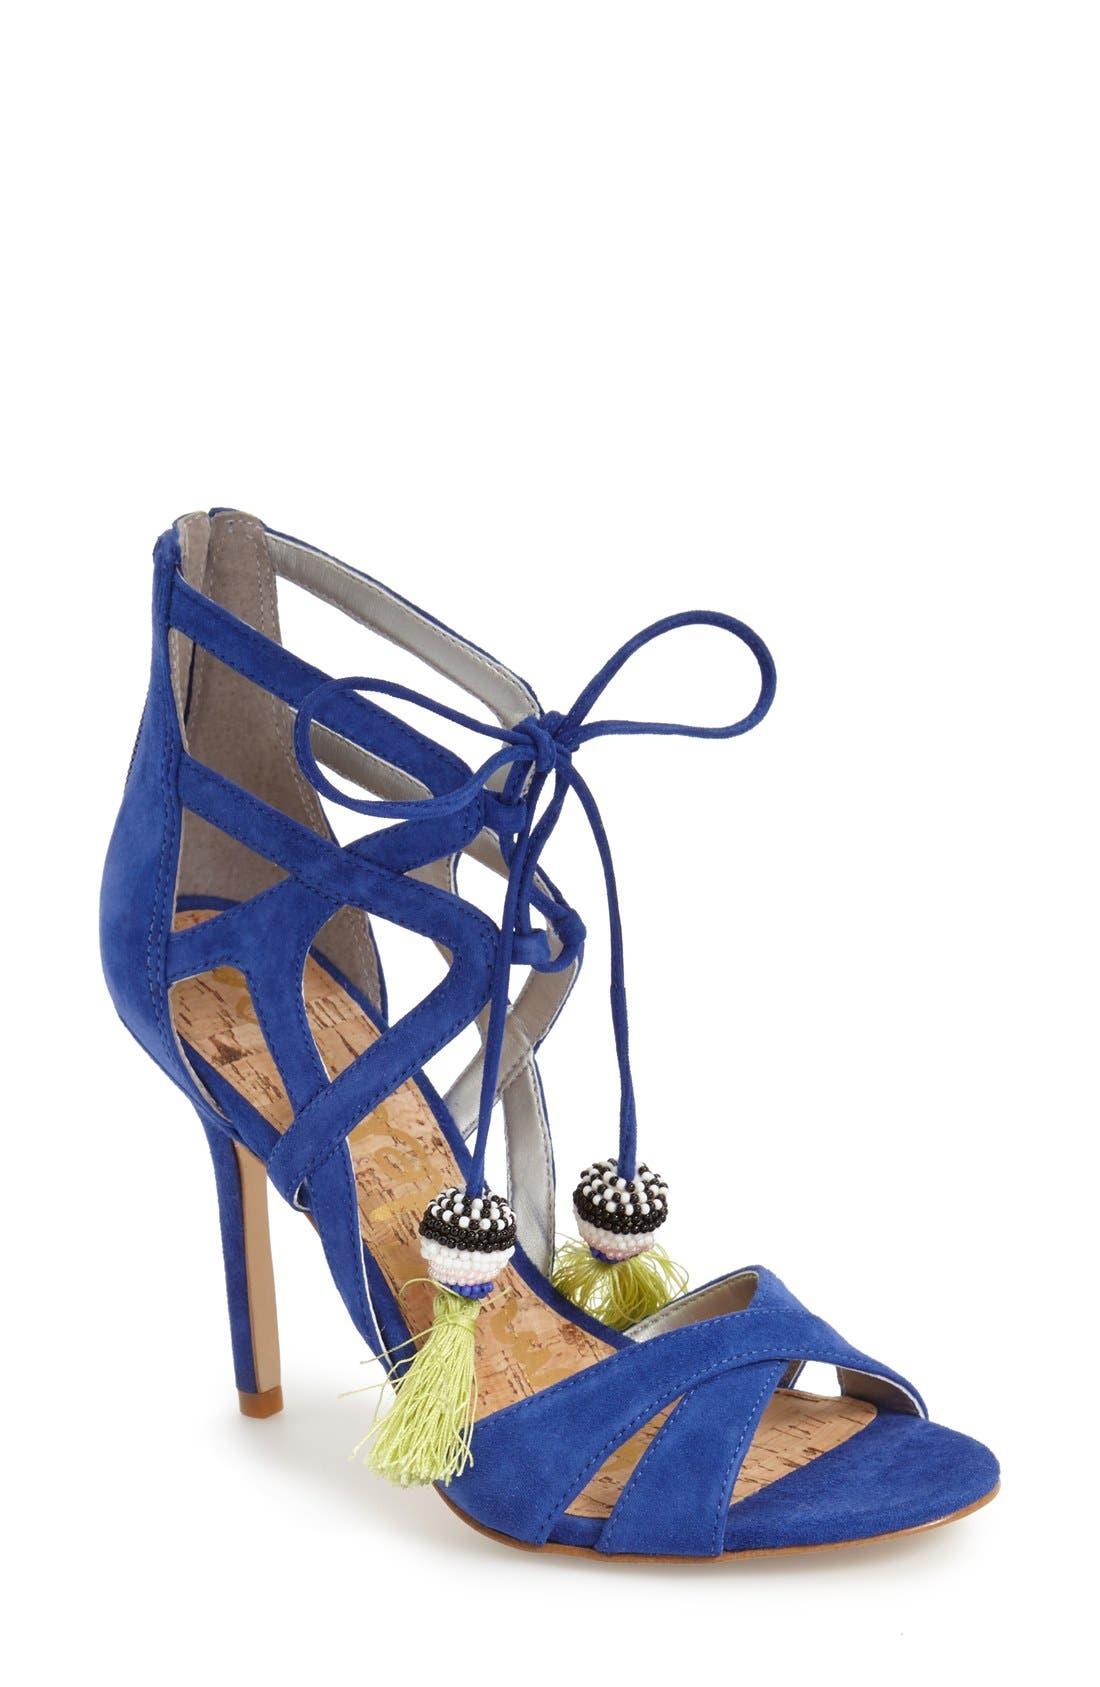 Main Image - Sam Edelman 'Azela' Tassel Lace-Up Sandal (Women)